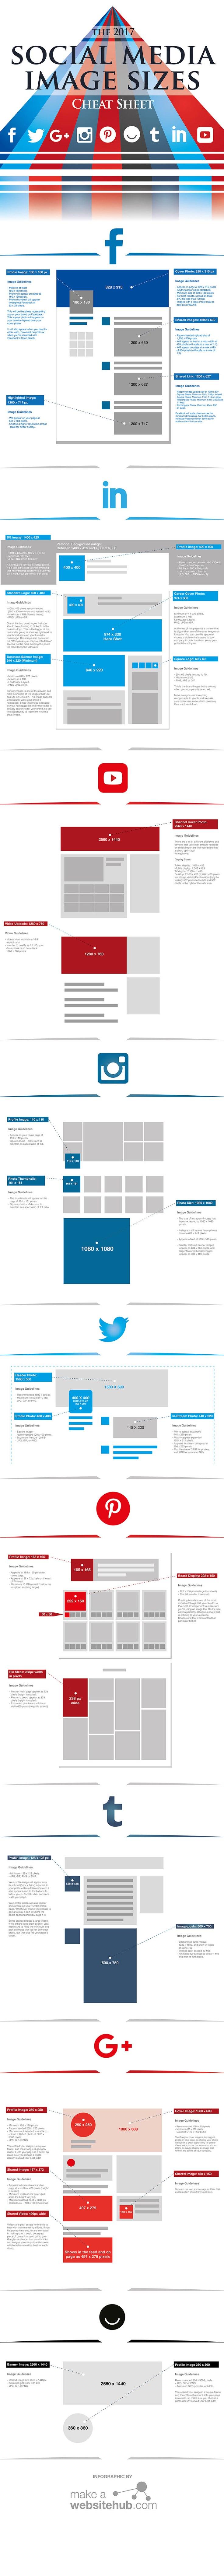 social-media-image-sizes-2017_sm